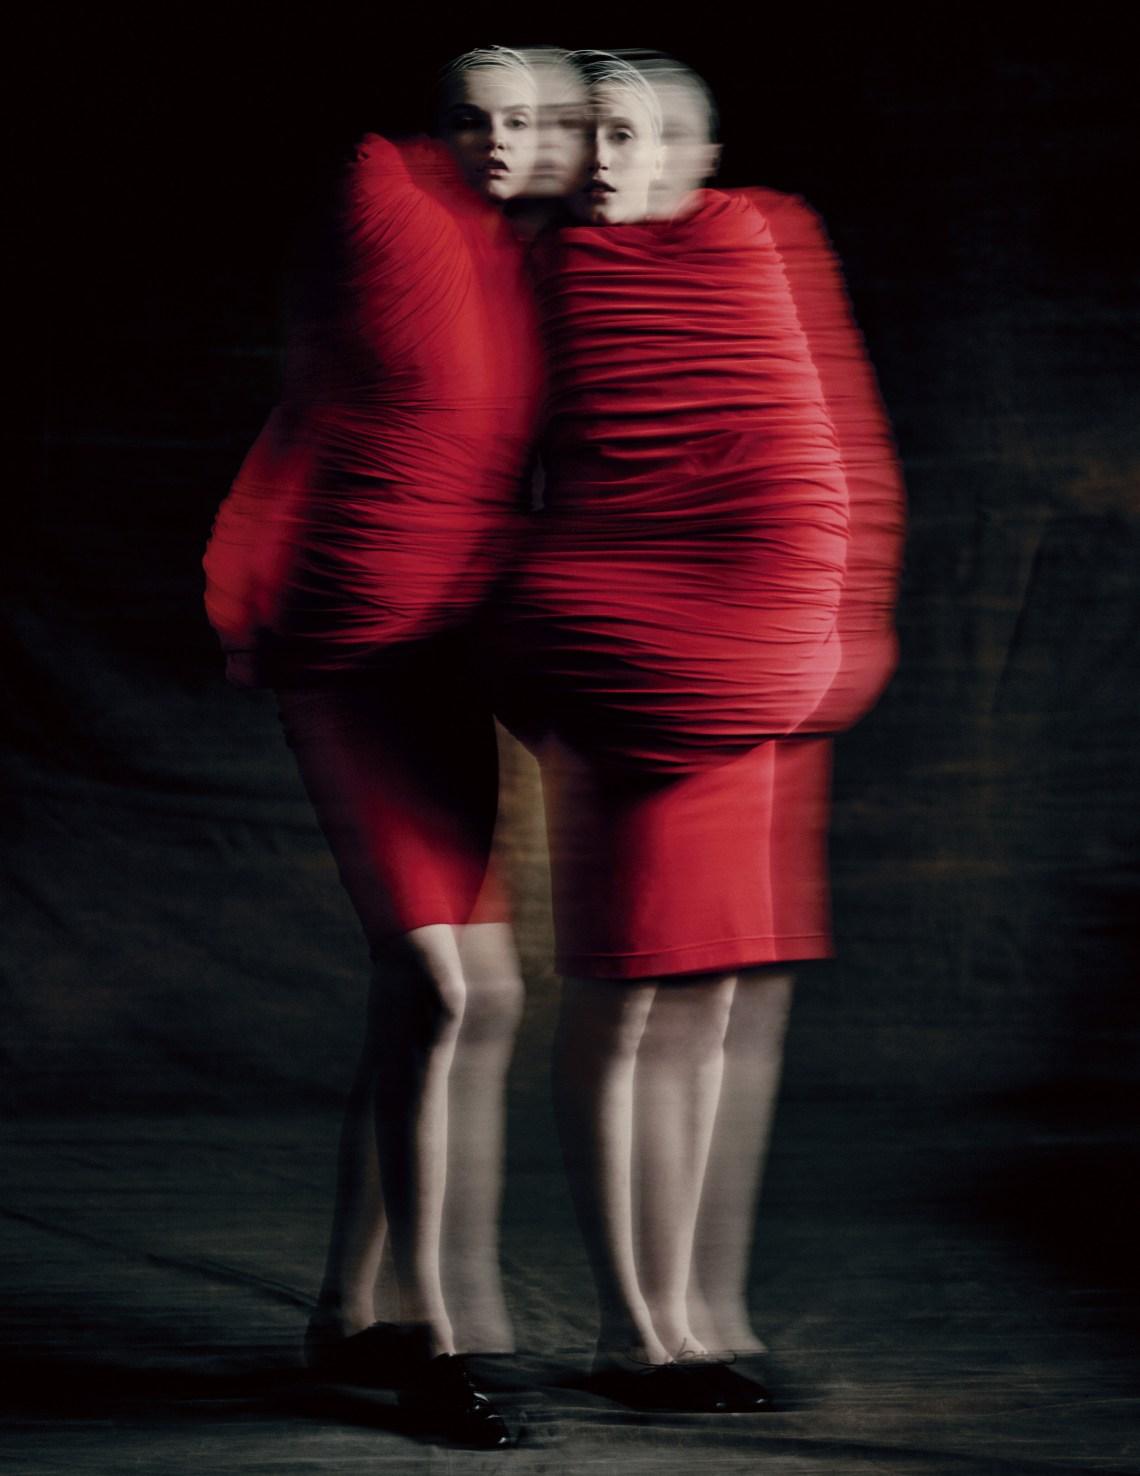 02.BodyMeetsDress DressMeetsBodySpring1997